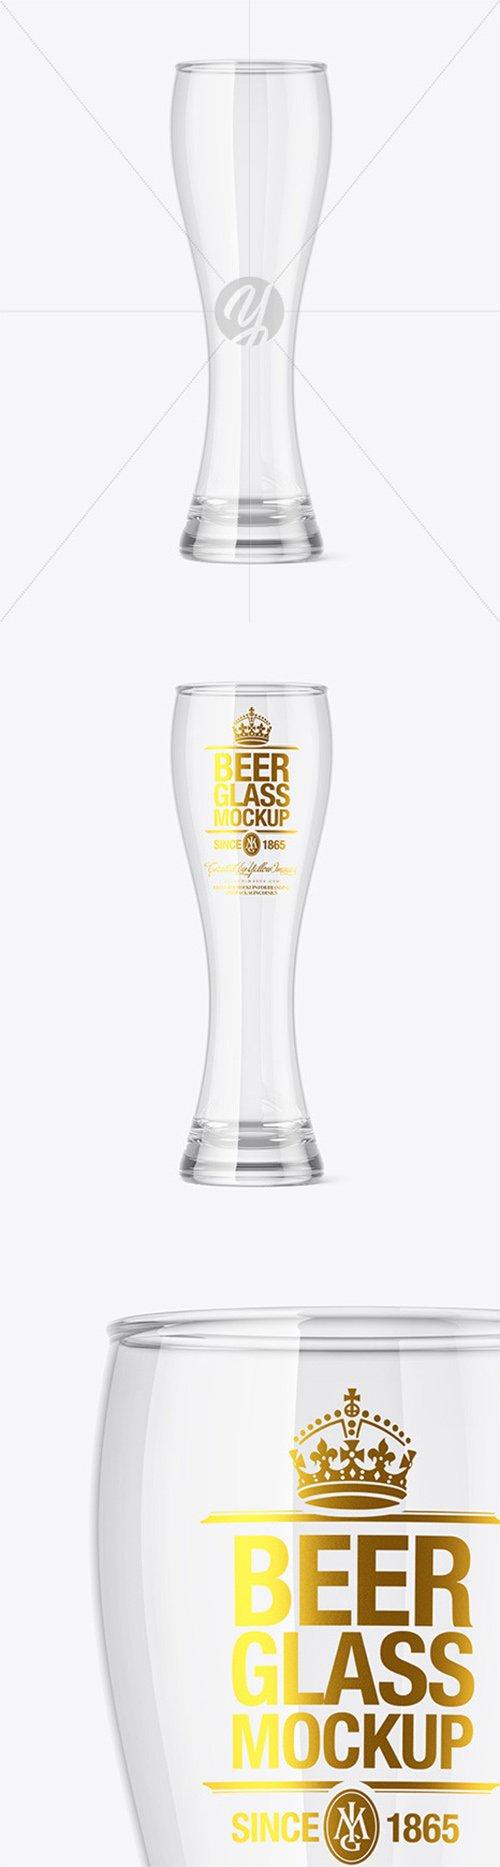 Empty Beer Glass Mockup 60255 TIF